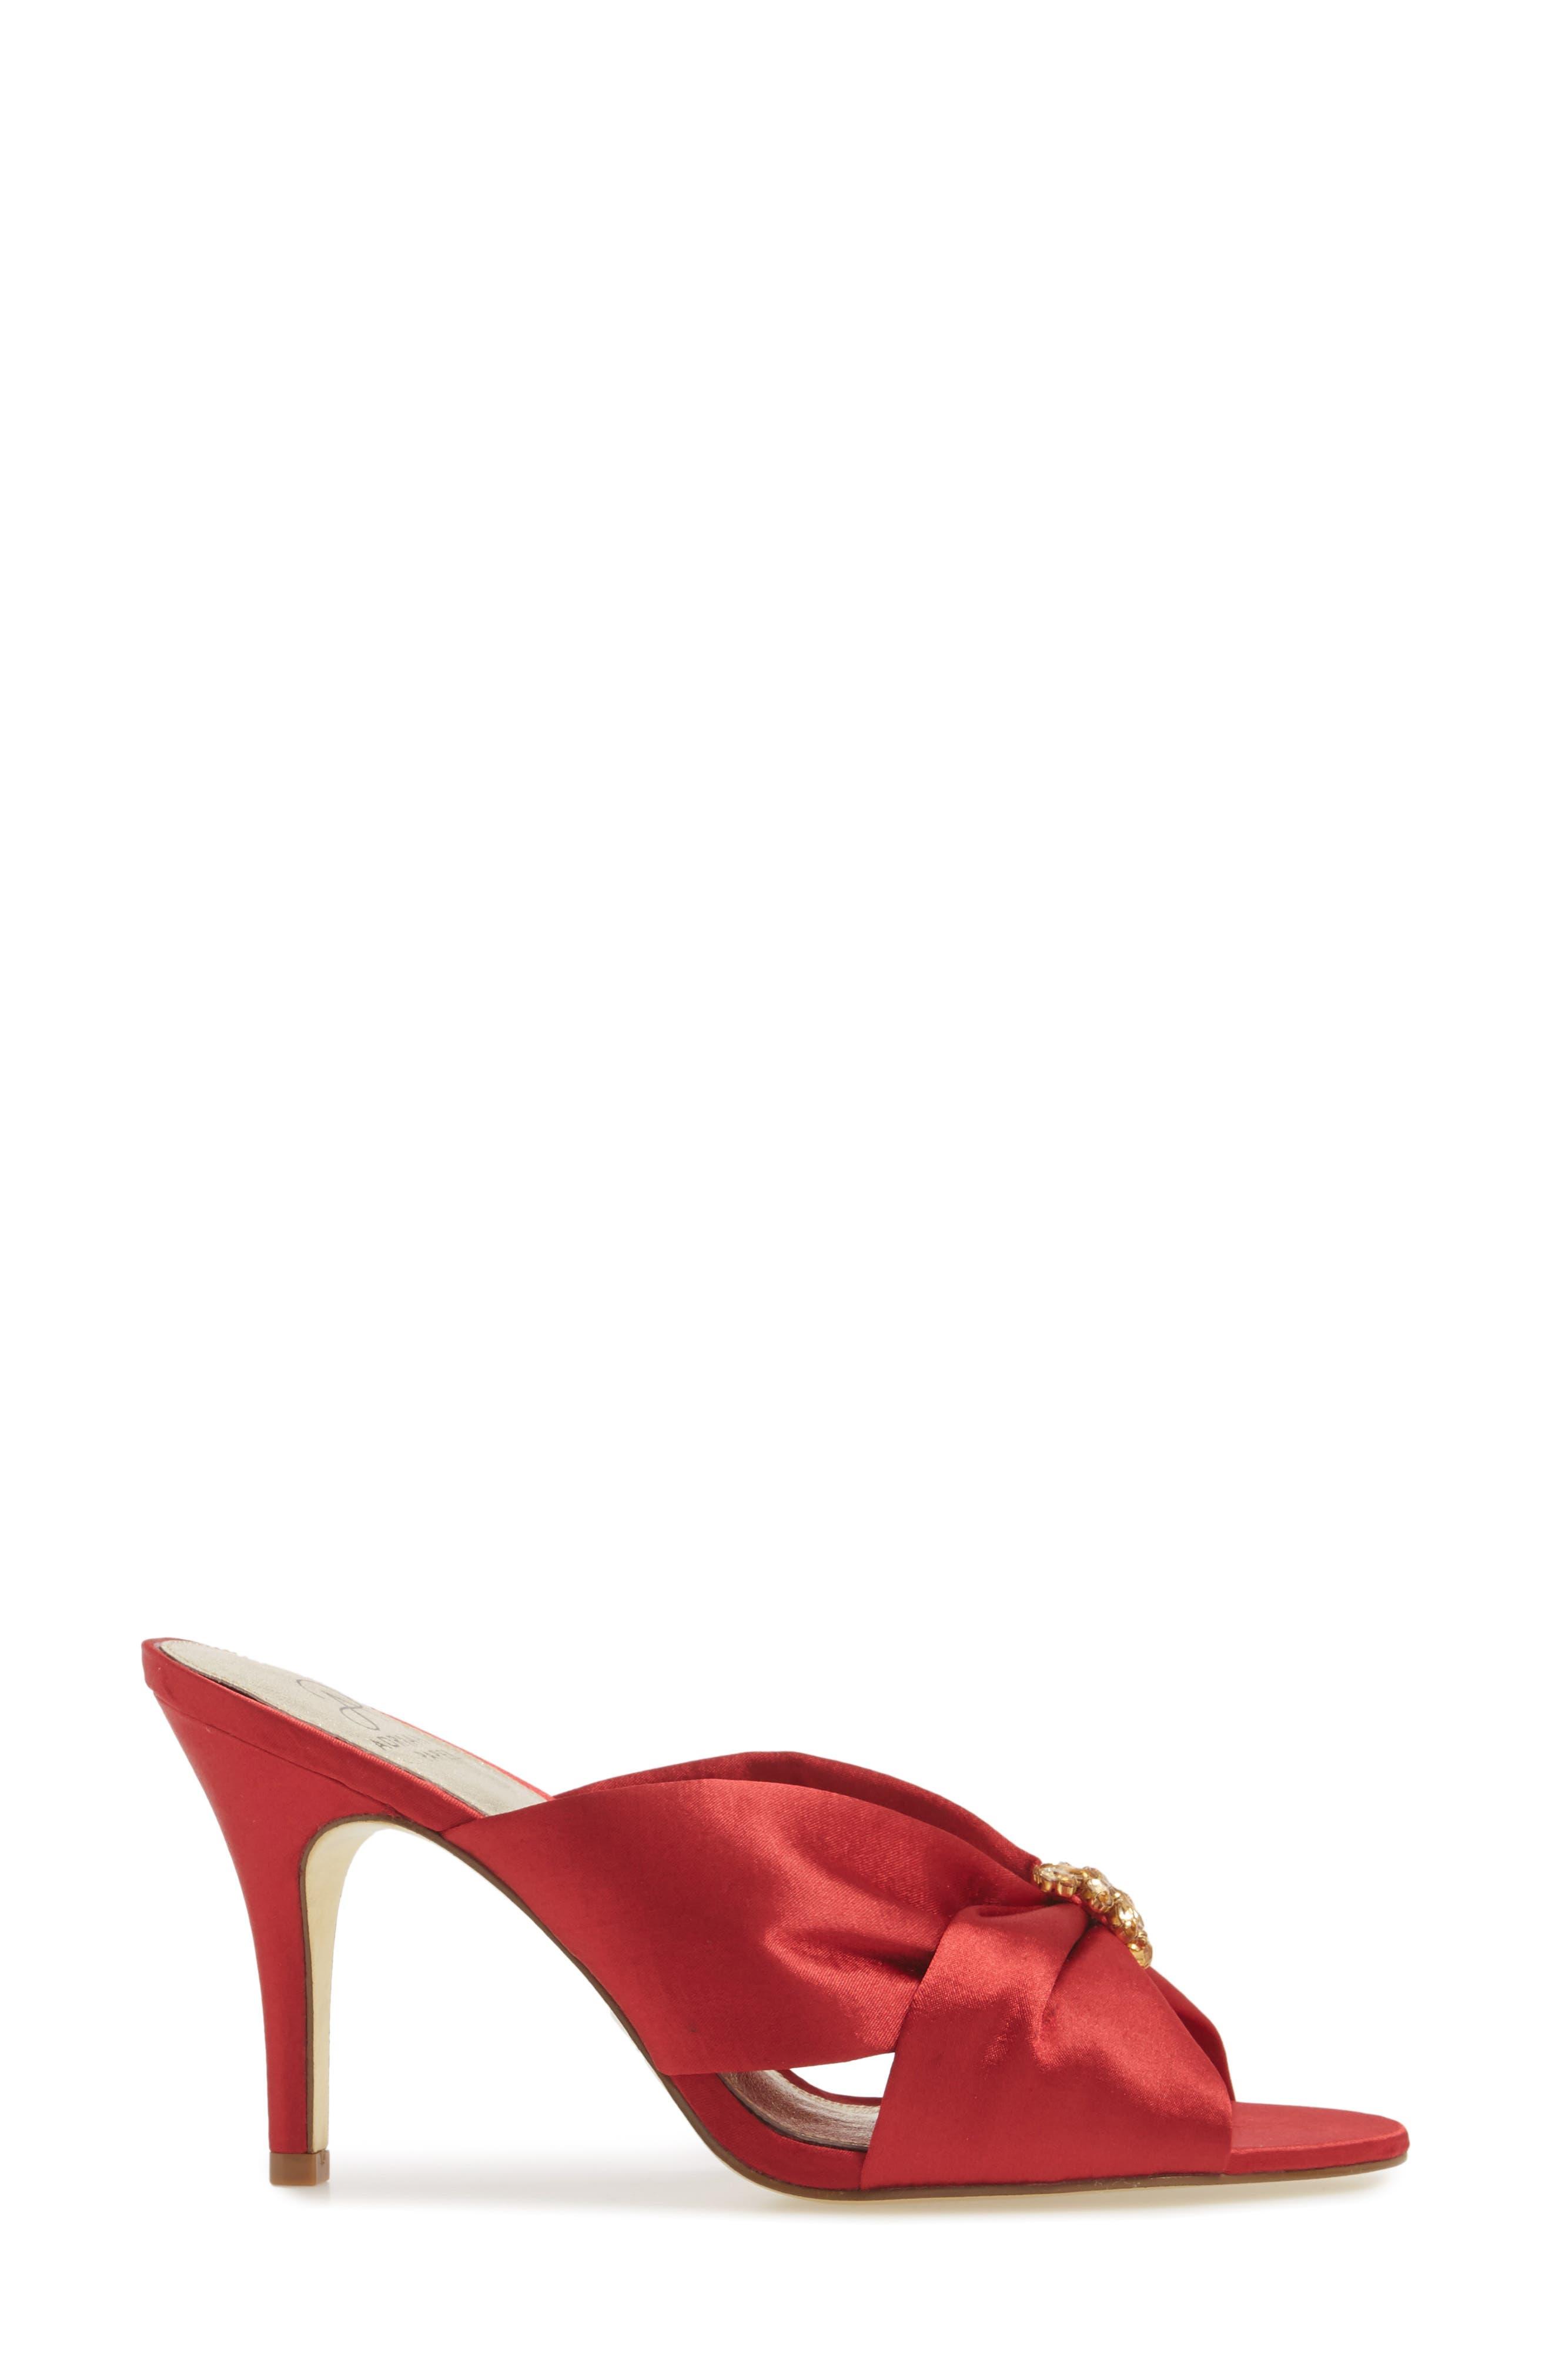 Flo Sandal,                             Alternate thumbnail 5, color,                             Red Satin